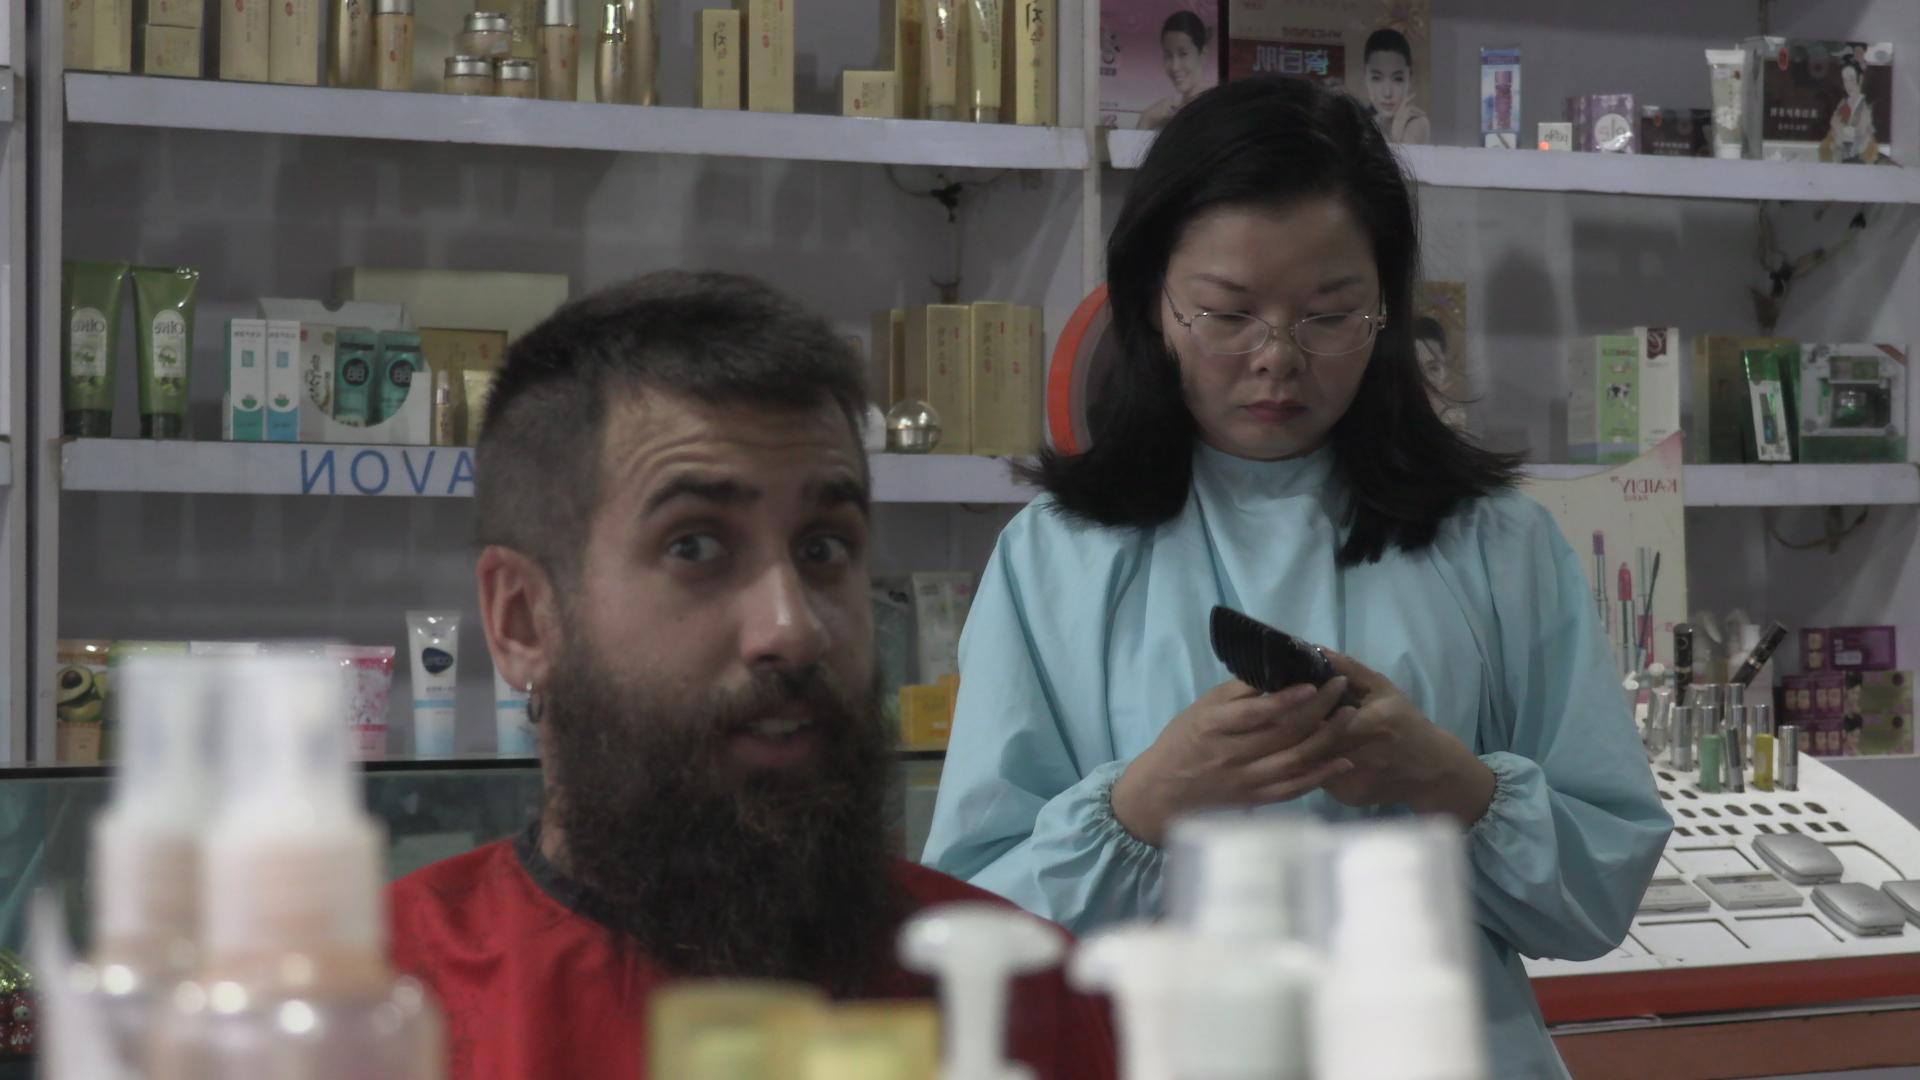 Peligroso corte de pelo en Laos